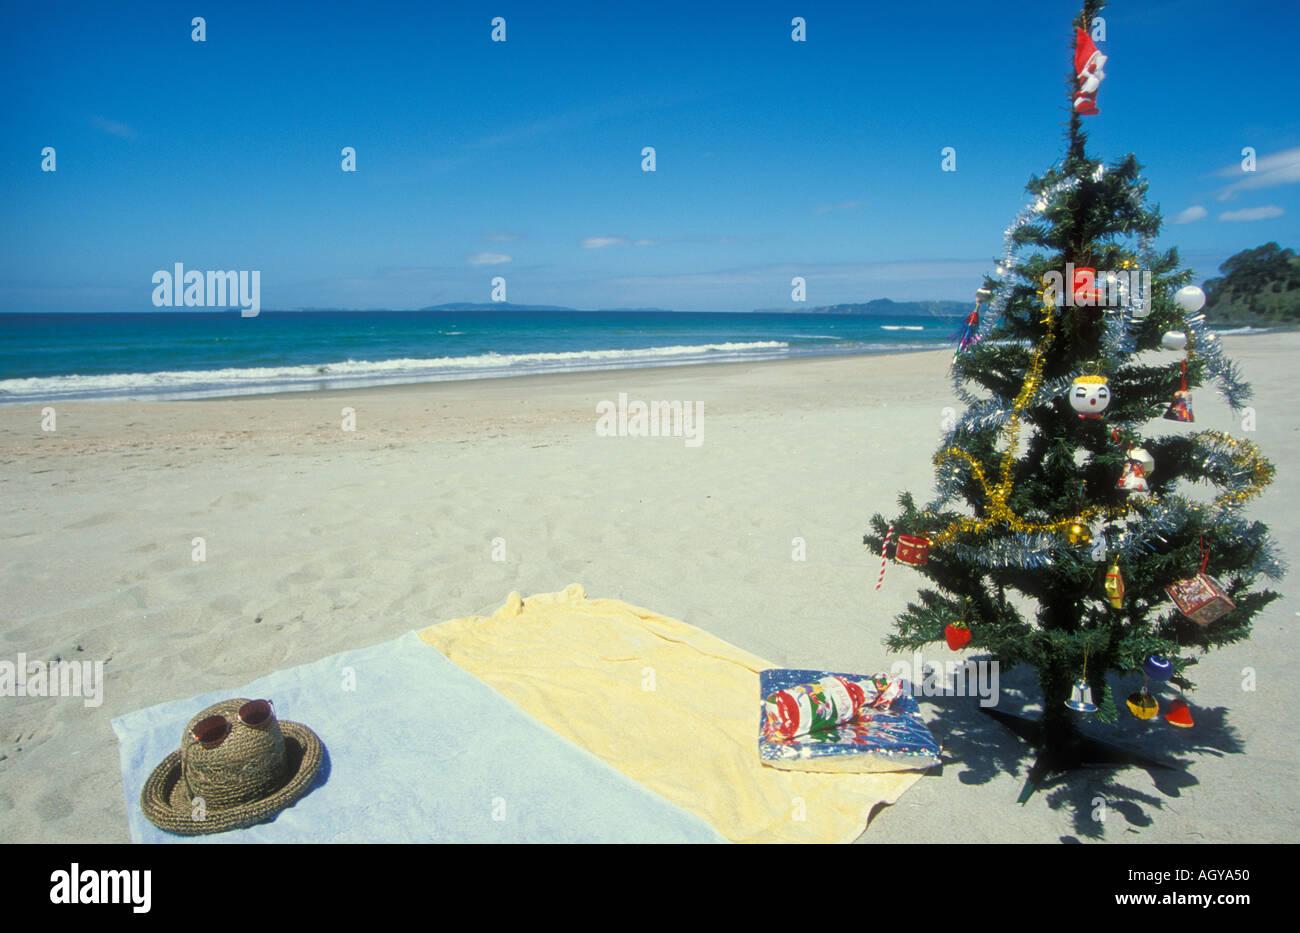 surreal kiwi christmas on the beach coromandel peninsula north island new zealand stock image